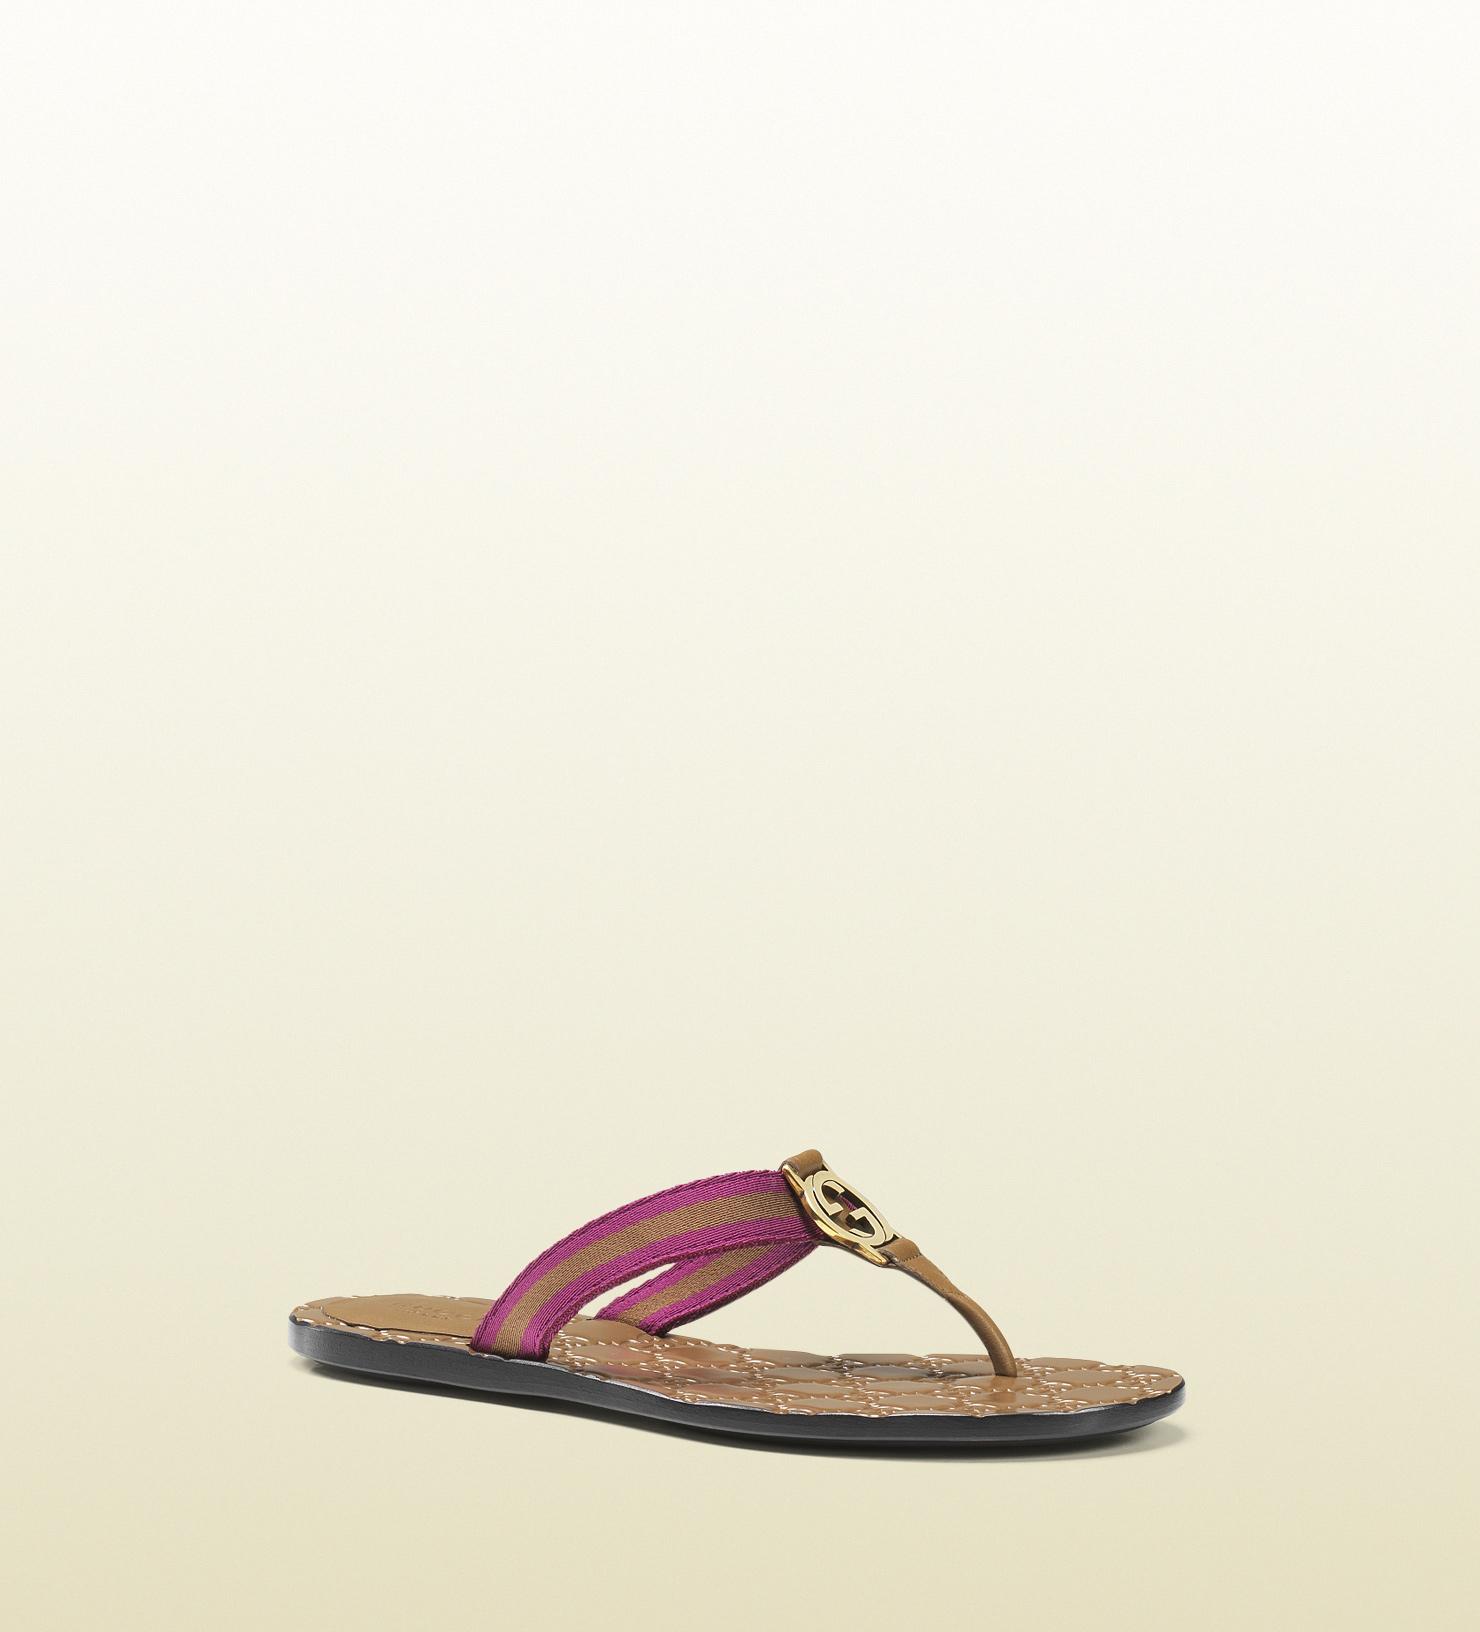 e89932132378 Lyst - Gucci Gg Thong Nylon Web Sandal in Pink for Men